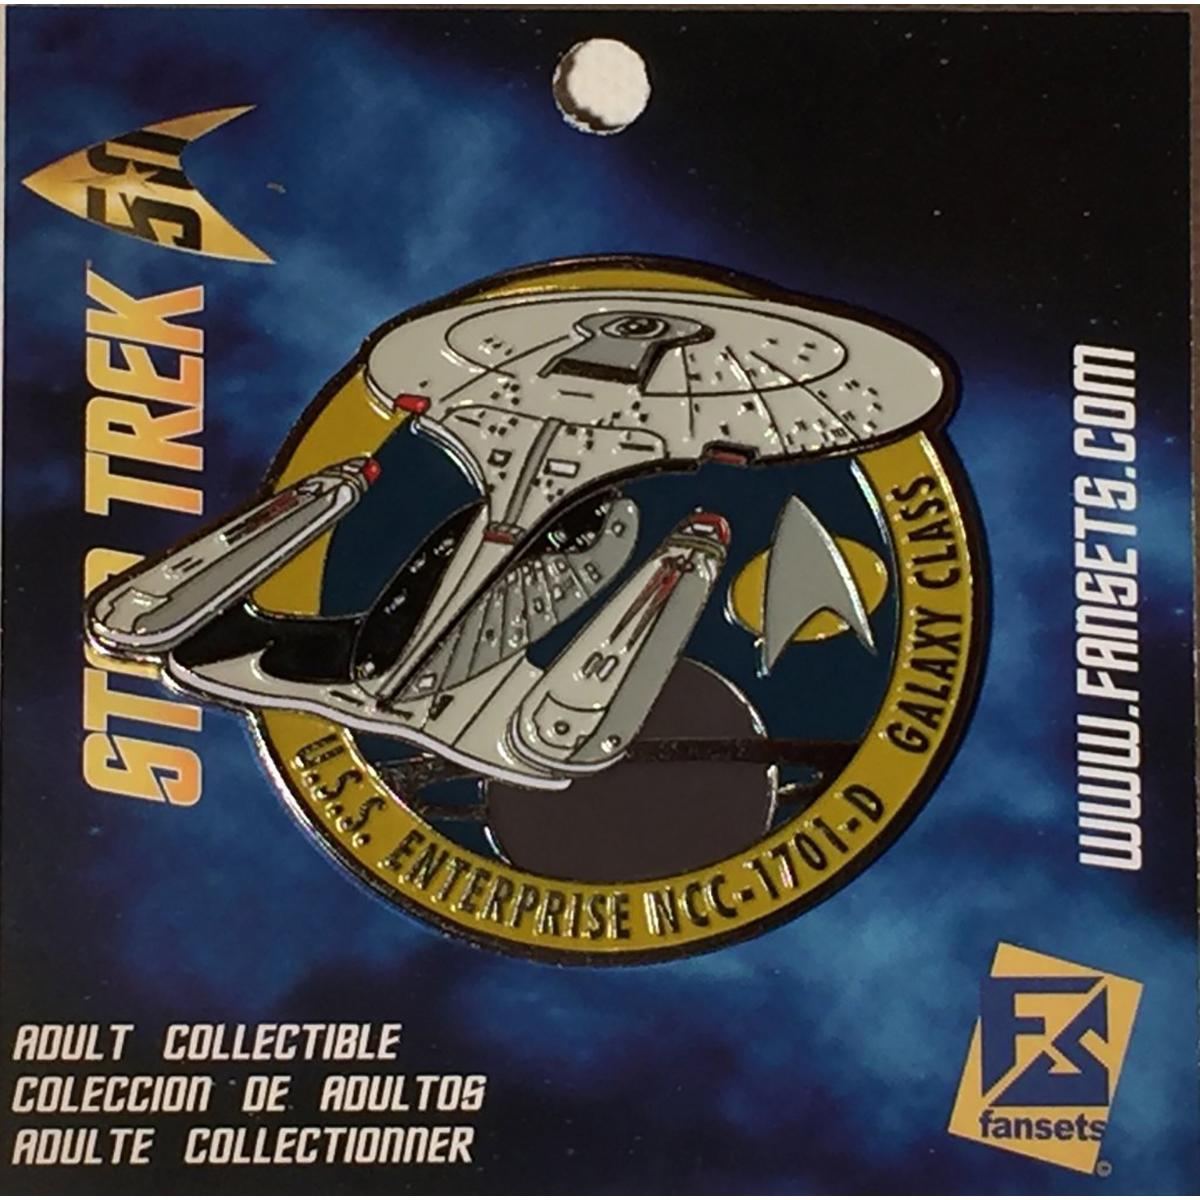 Star Trek The Next Generation Enterprise NCC 1701-D Collector's Pin